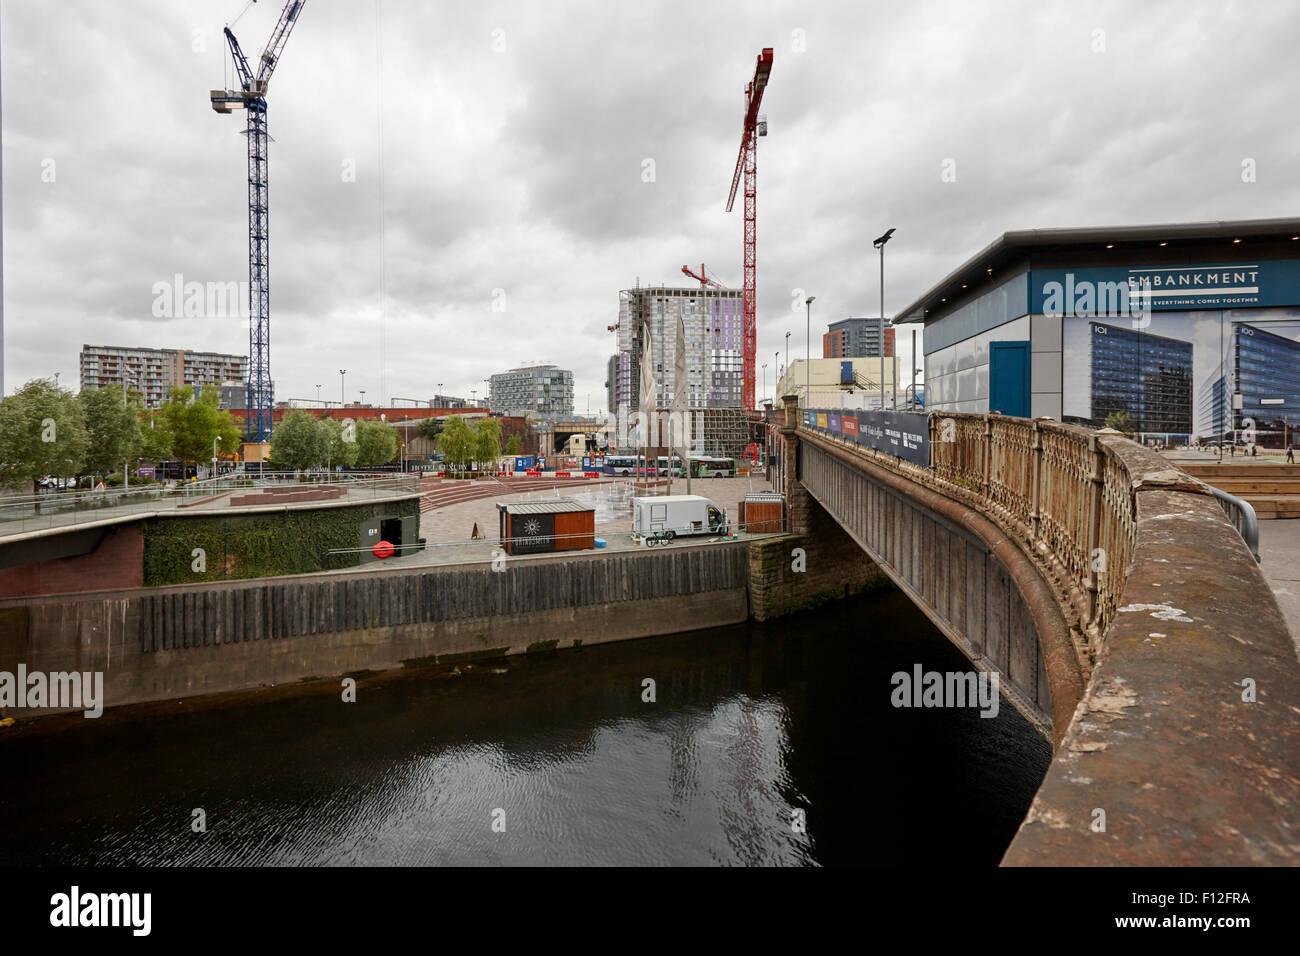 greengate embankment development between salford and Manchester uk - Stock Image